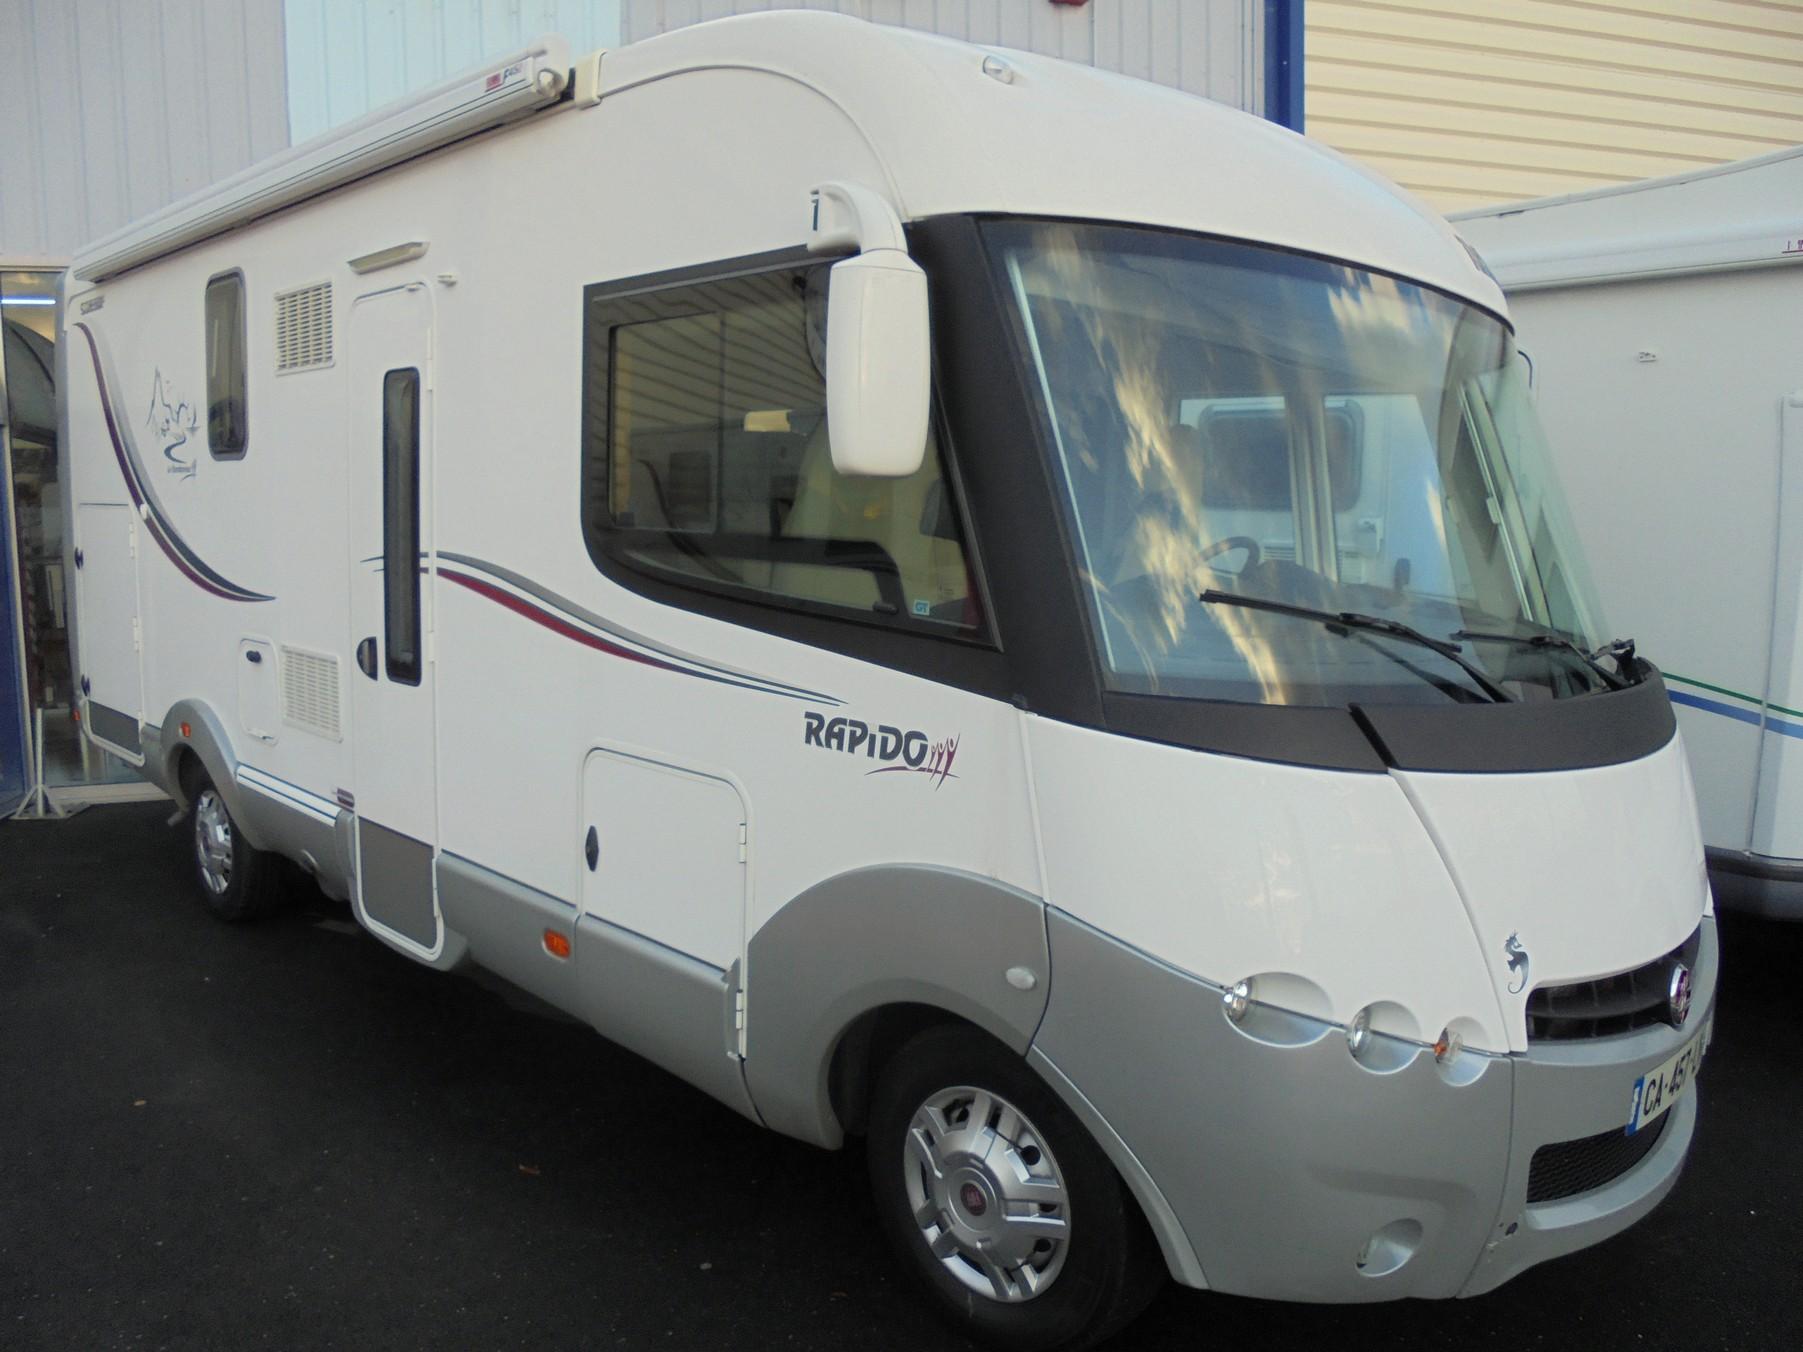 rapido 9083 df occasion de 2012 fiat camping car en vente treillieres loire atlantique 44. Black Bedroom Furniture Sets. Home Design Ideas